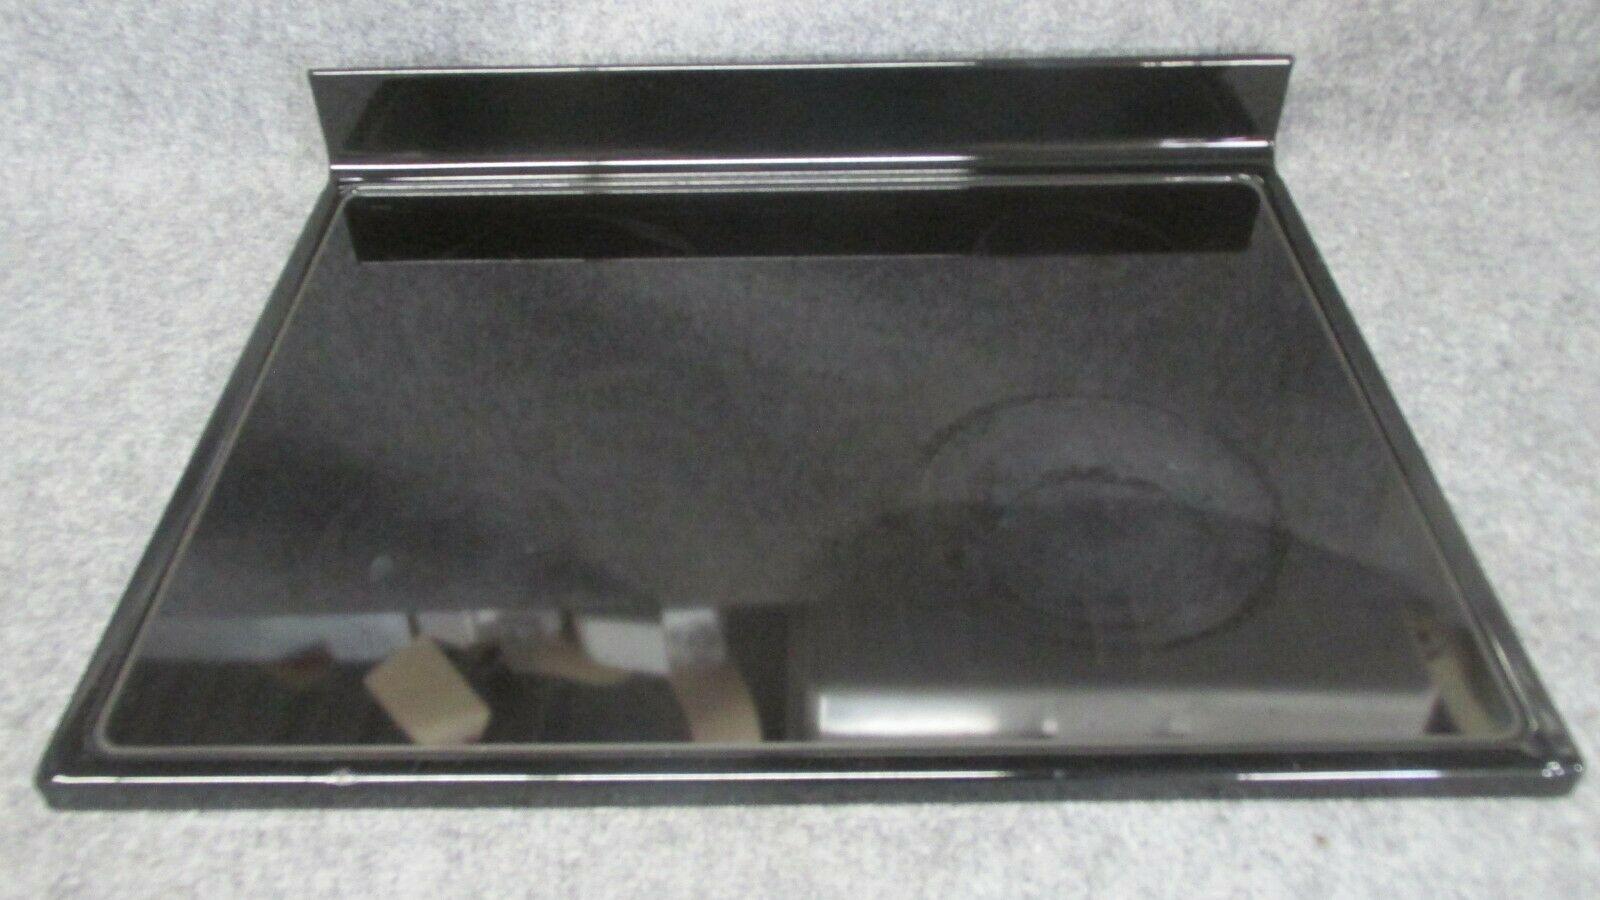 5706X494-09 AMANA RANGE OVEN MAIN TOP GLASS COOKTOP - $150.00